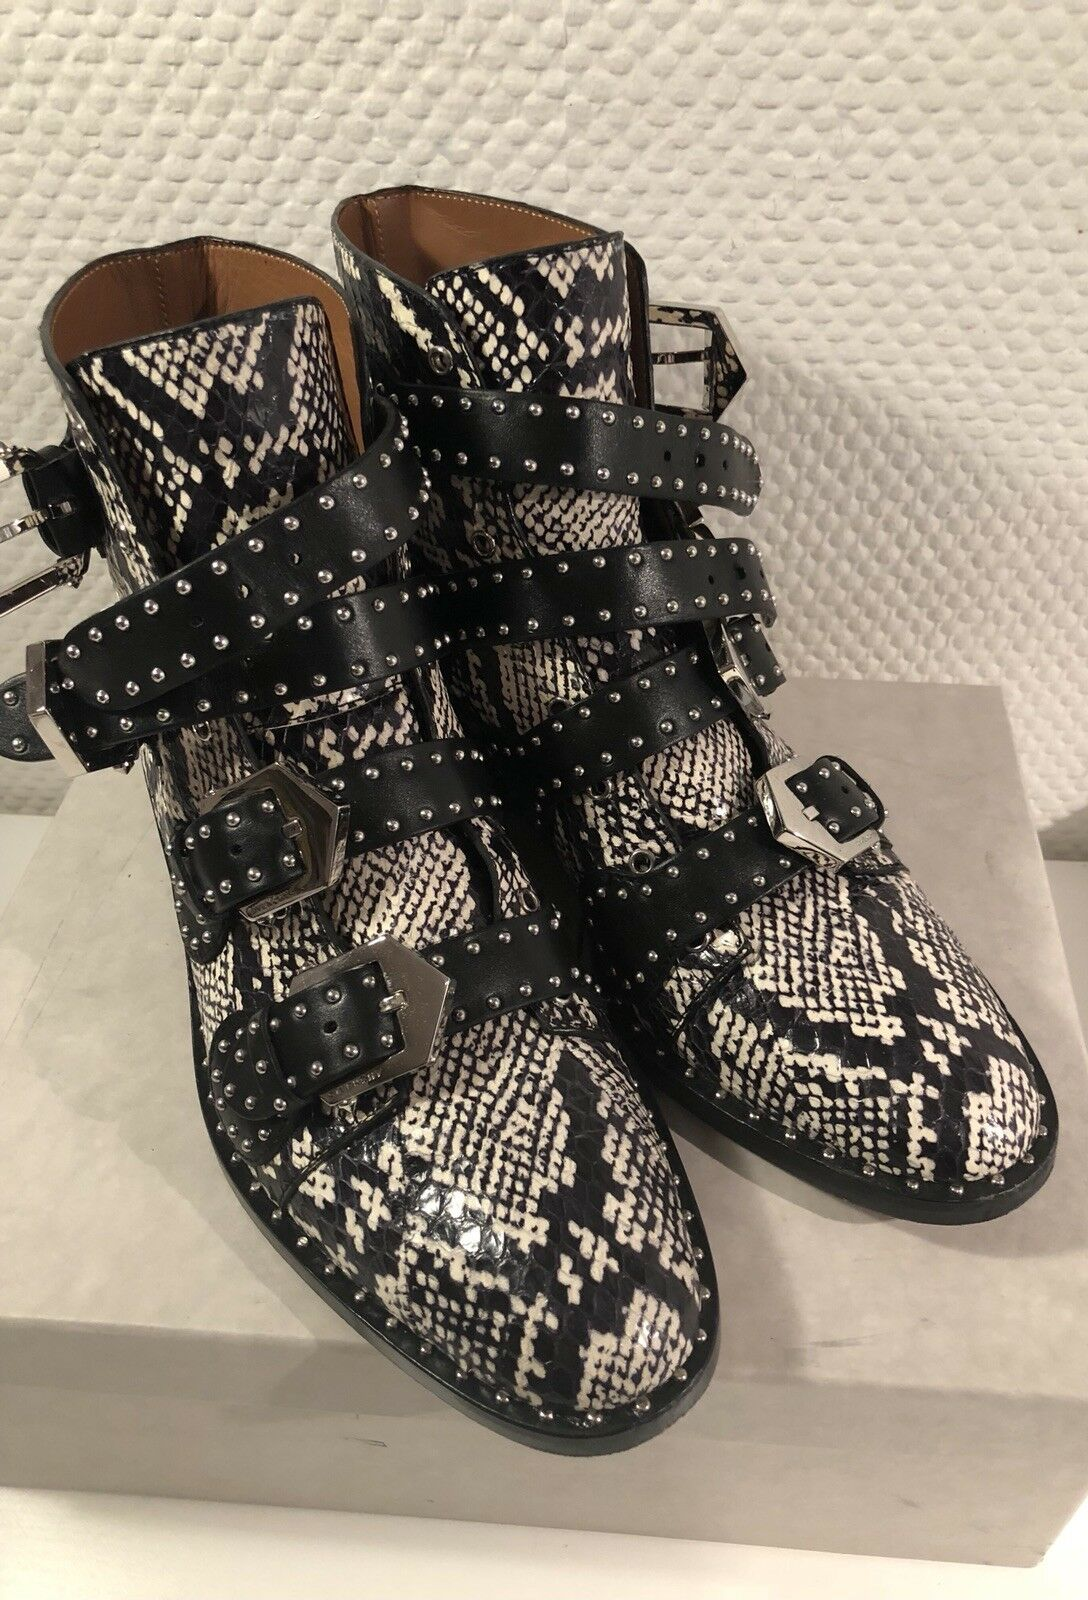 Givenchy Snake Stiefeletten Stiefel Ankle Stiefel Leder 38 (38,5) Schwarz Weiss